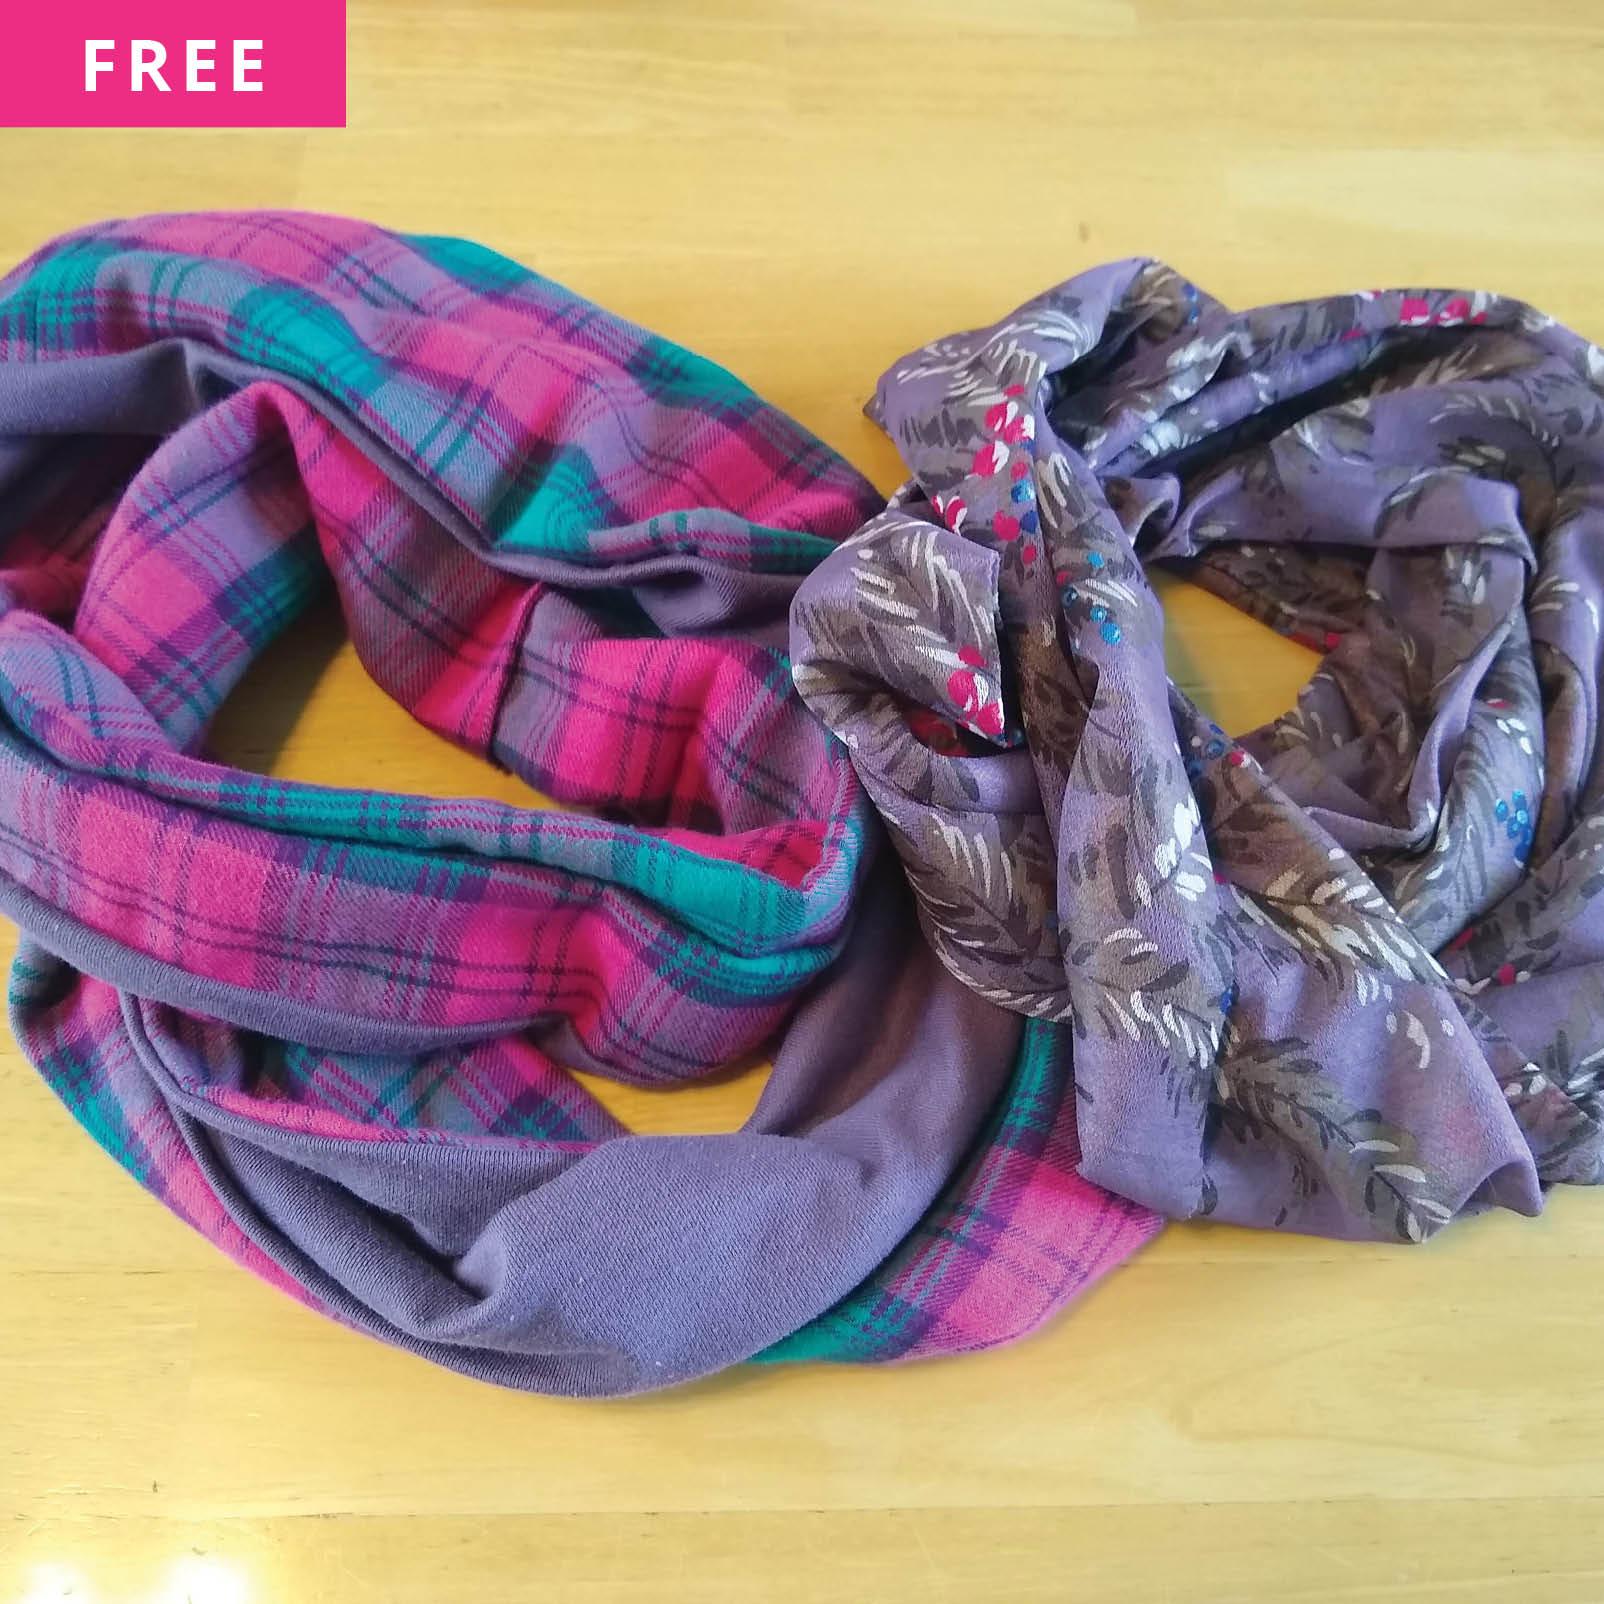 Free Sewing Pattern - Infinity Scarf: 2 Ways